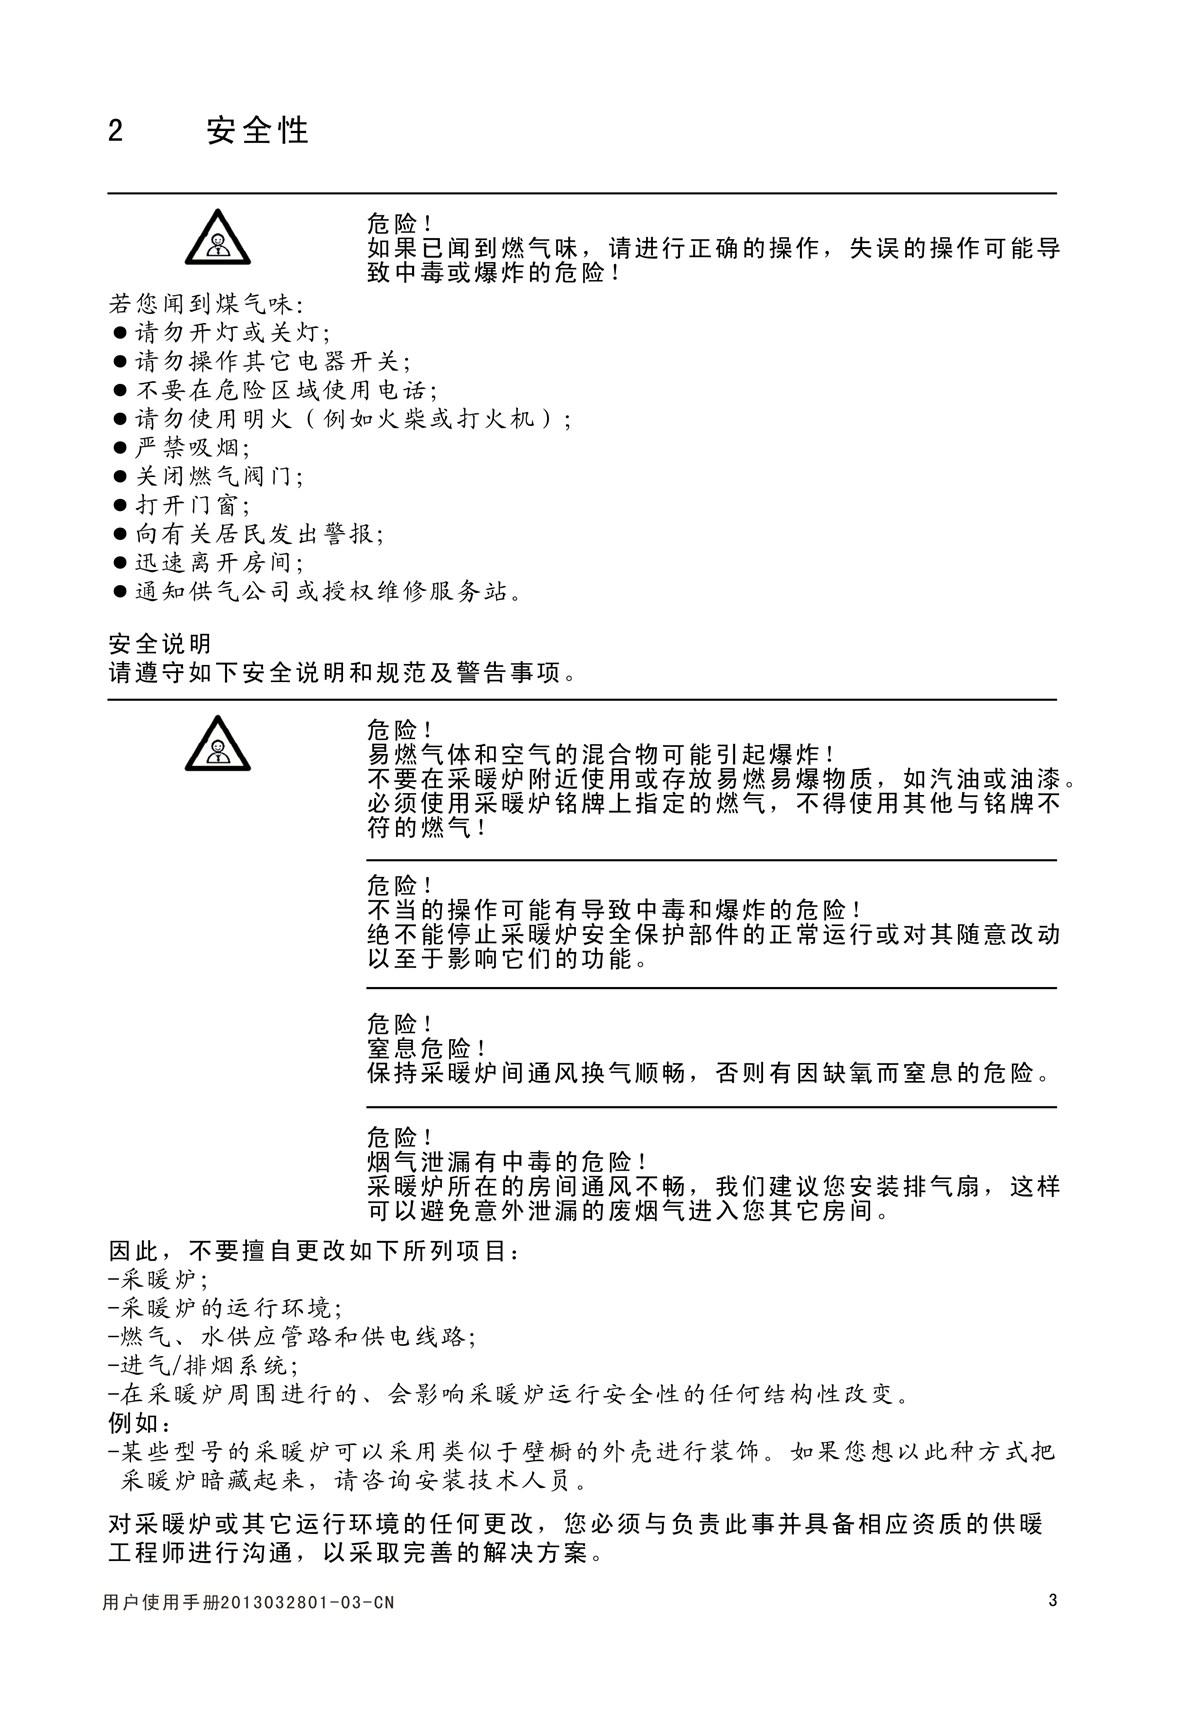 ES02系列-用户使用手册-4_02.jpg